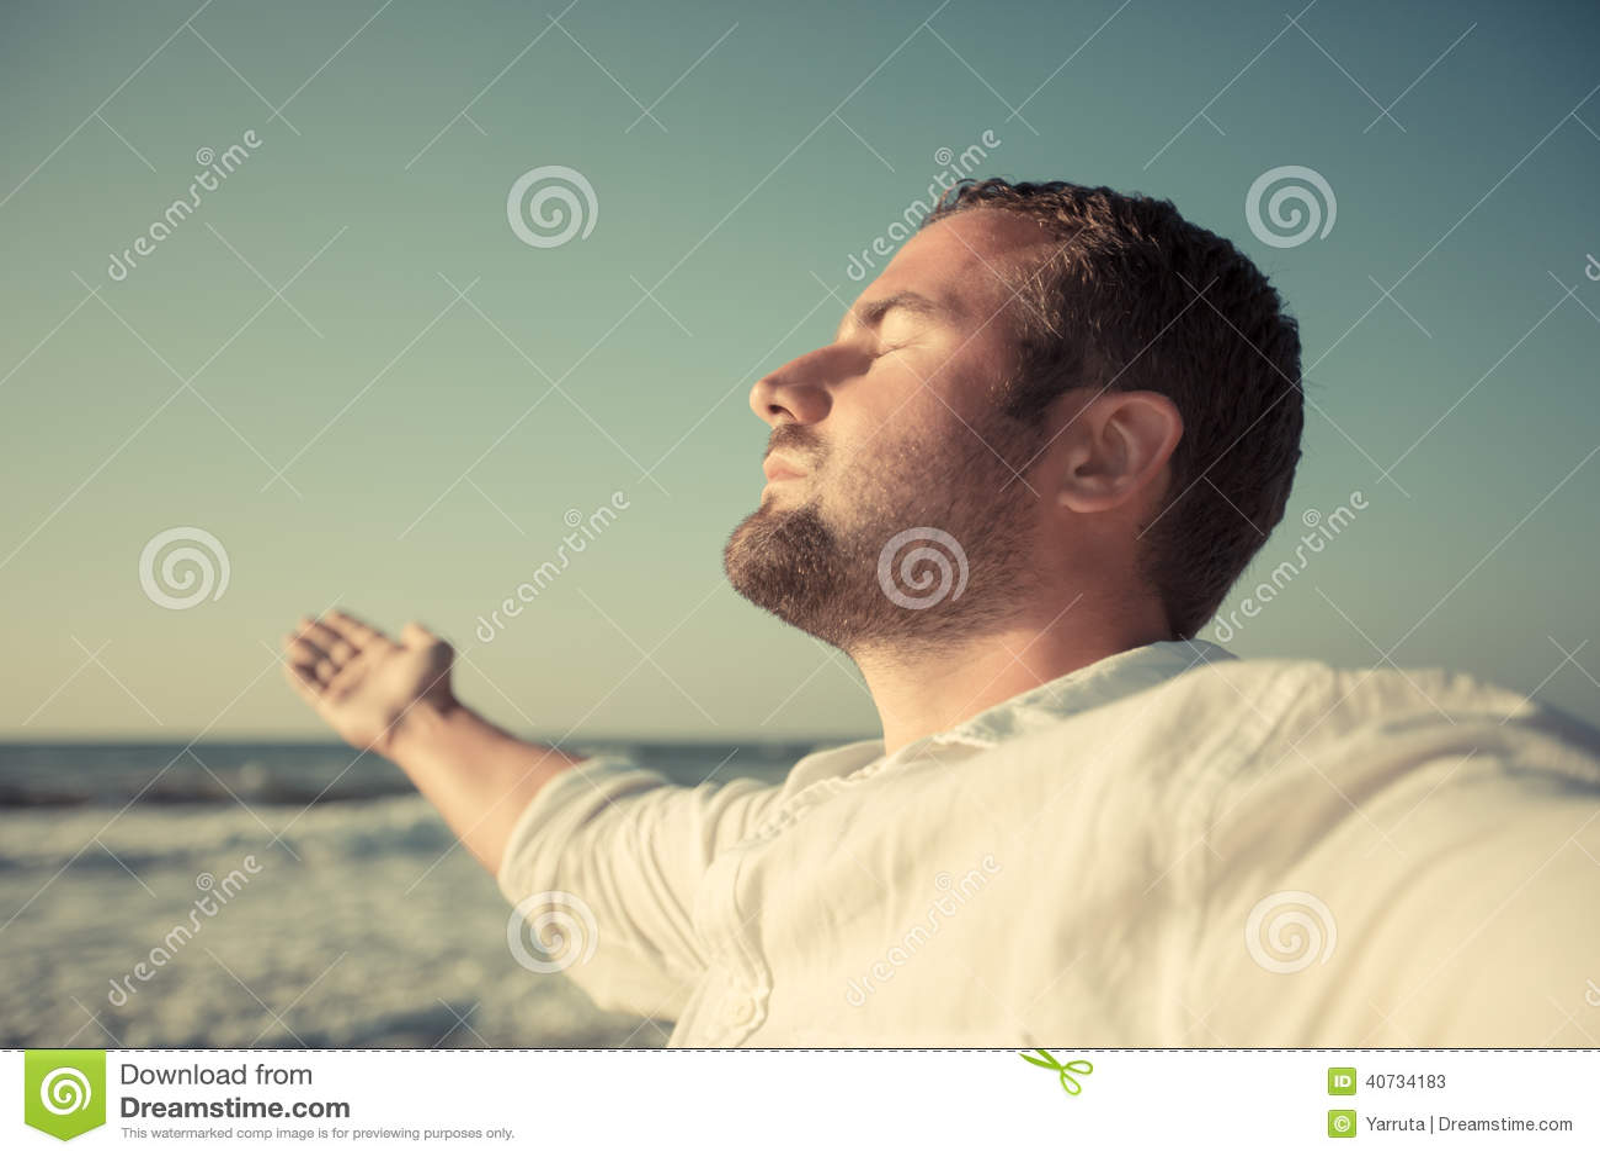 Happy man enjoying life at the beach